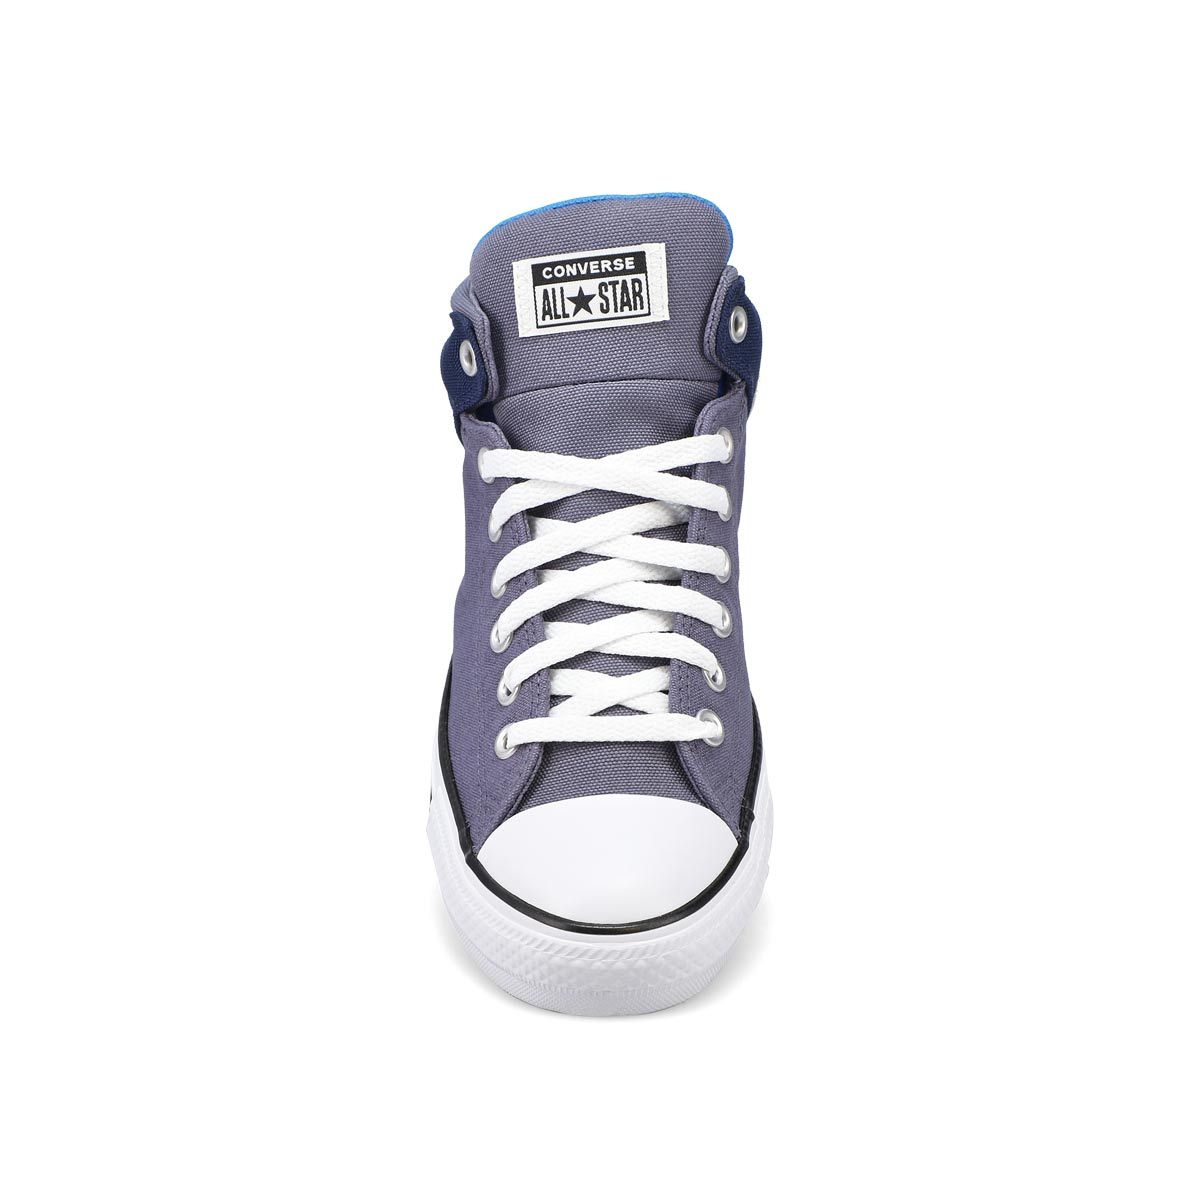 Men's All Star High Street Sneaker - Navy/Grey